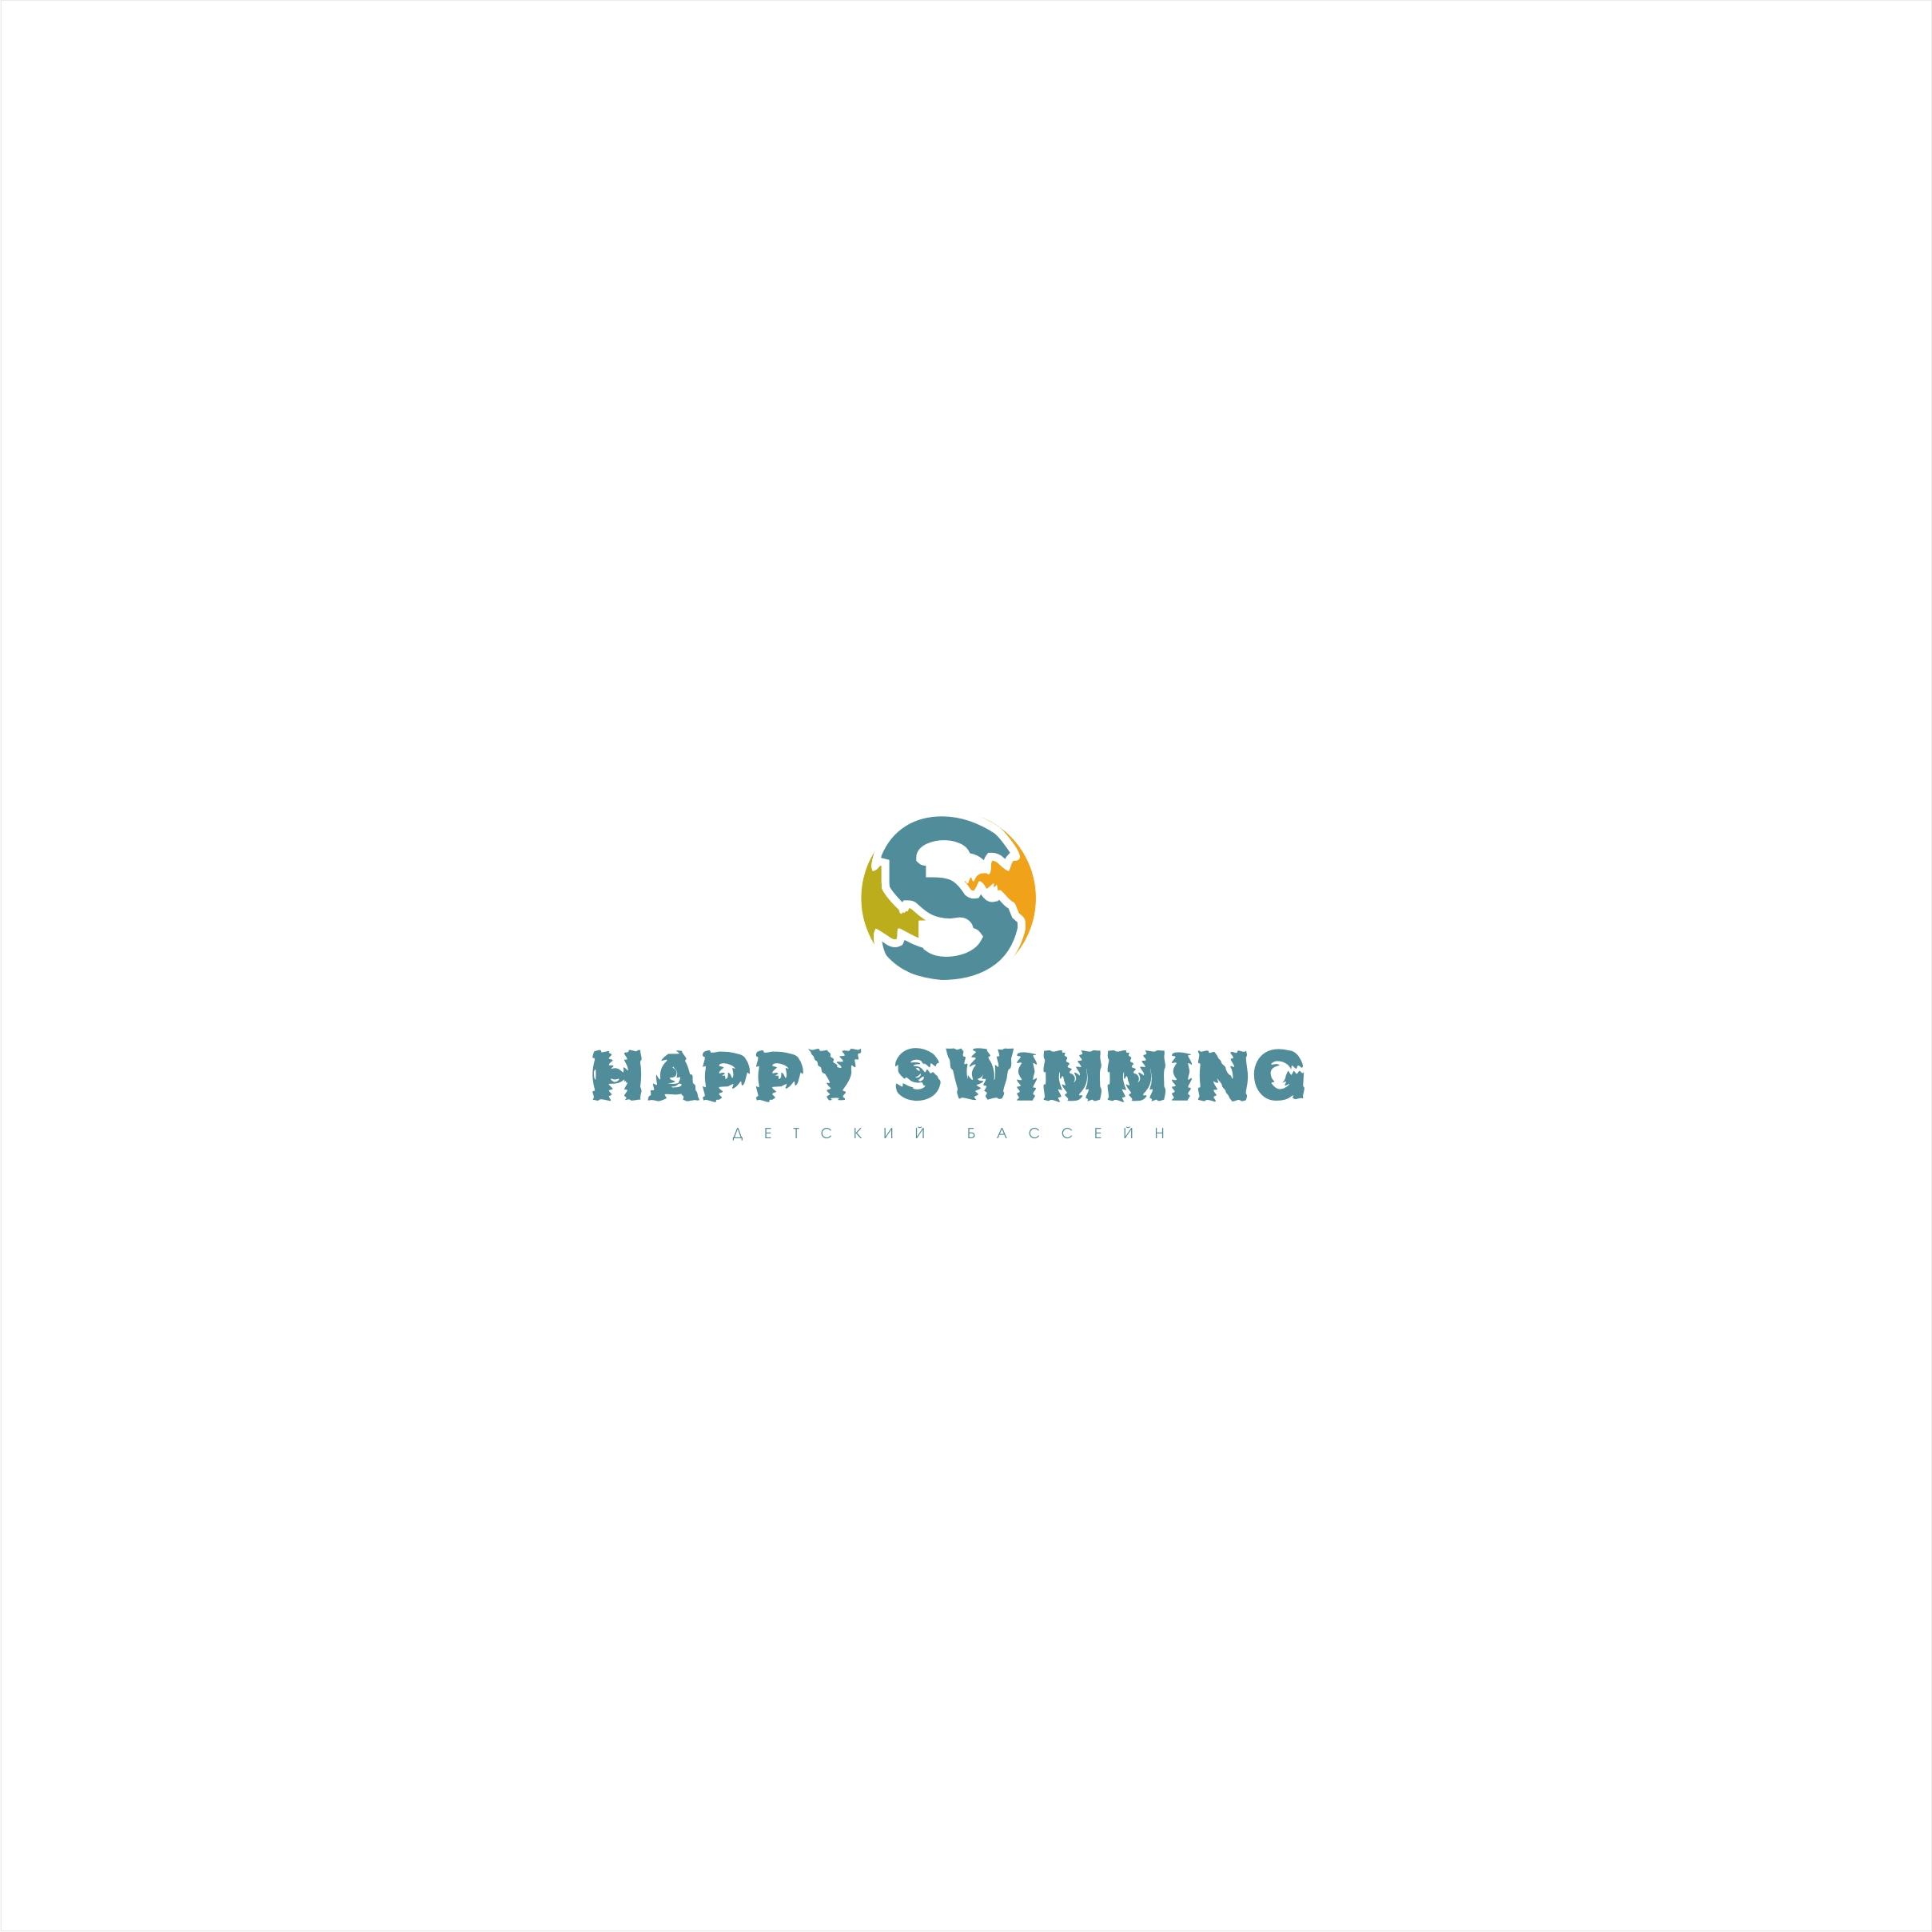 Логотип для  детского бассейна. фото f_6995c73c1ff4ae6a.jpg